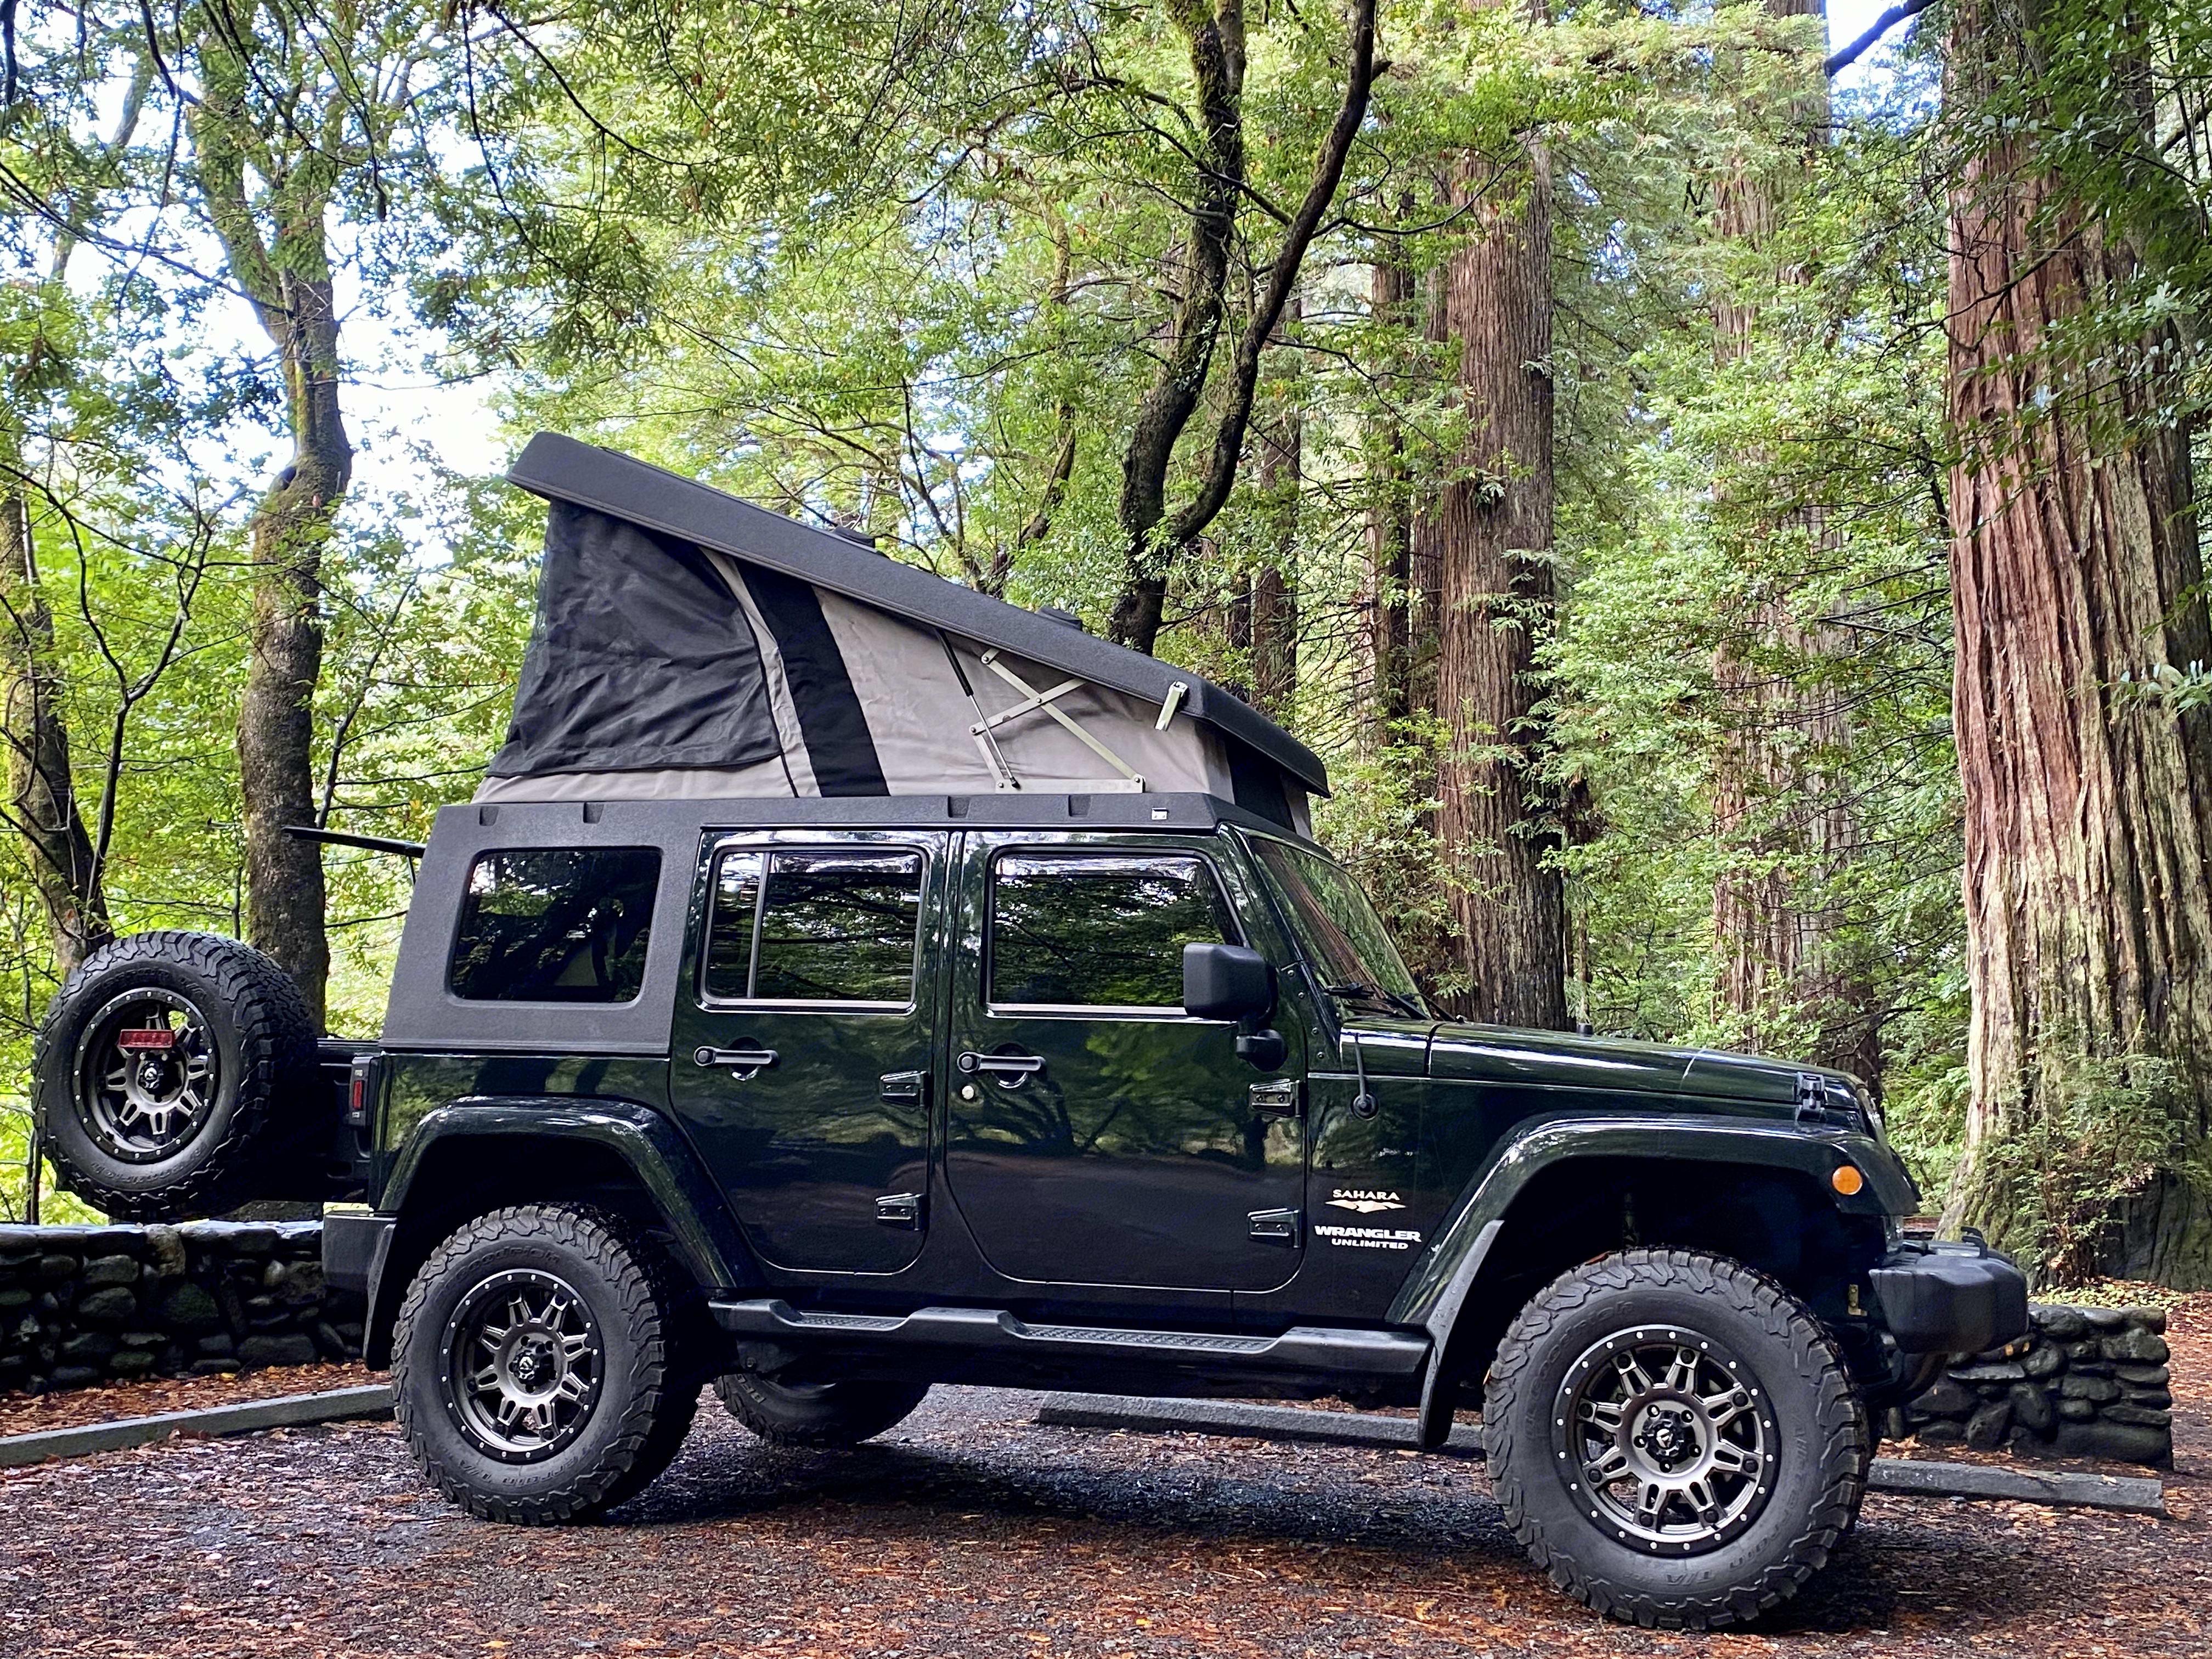 Jeep Wrangler Sahara Unlimited 2012